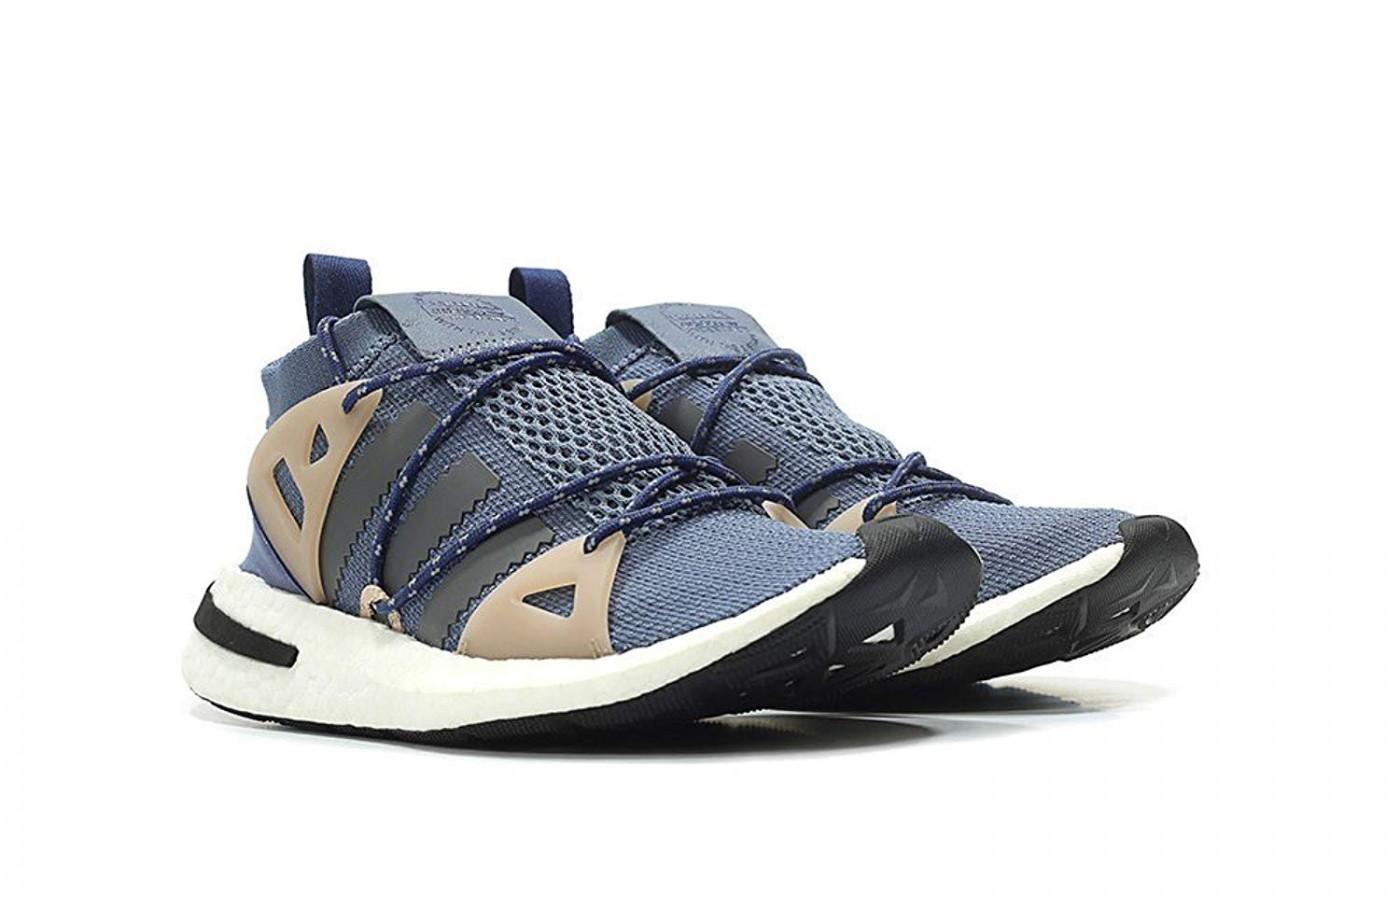 Adidas Arkyn pair